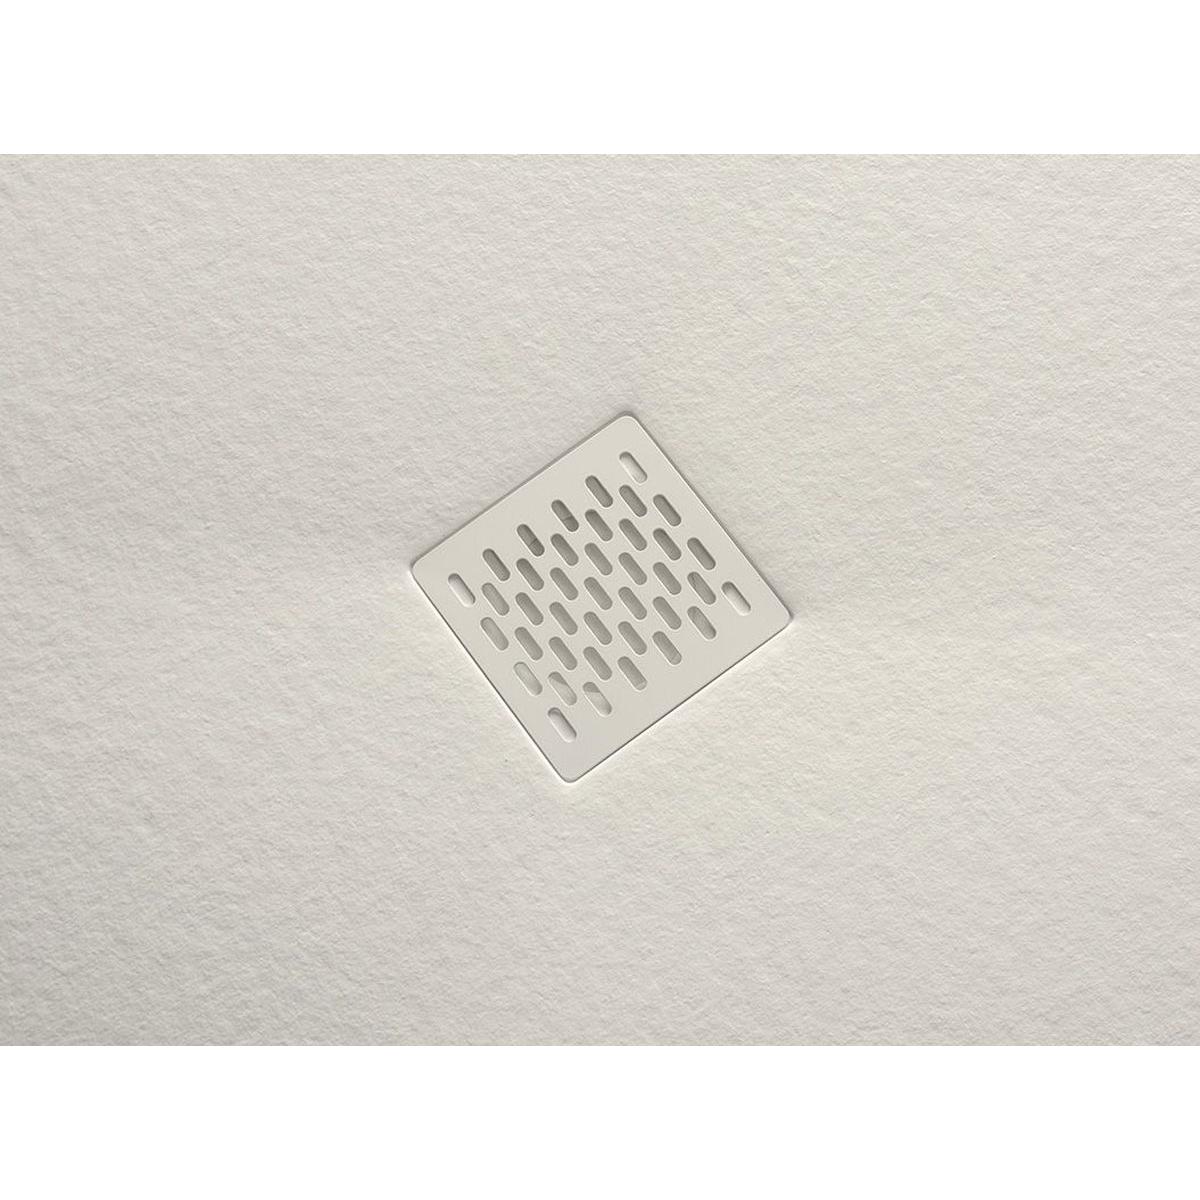 Plato de ducha rectangular 120x80 Coliseo Stone Nox Beige